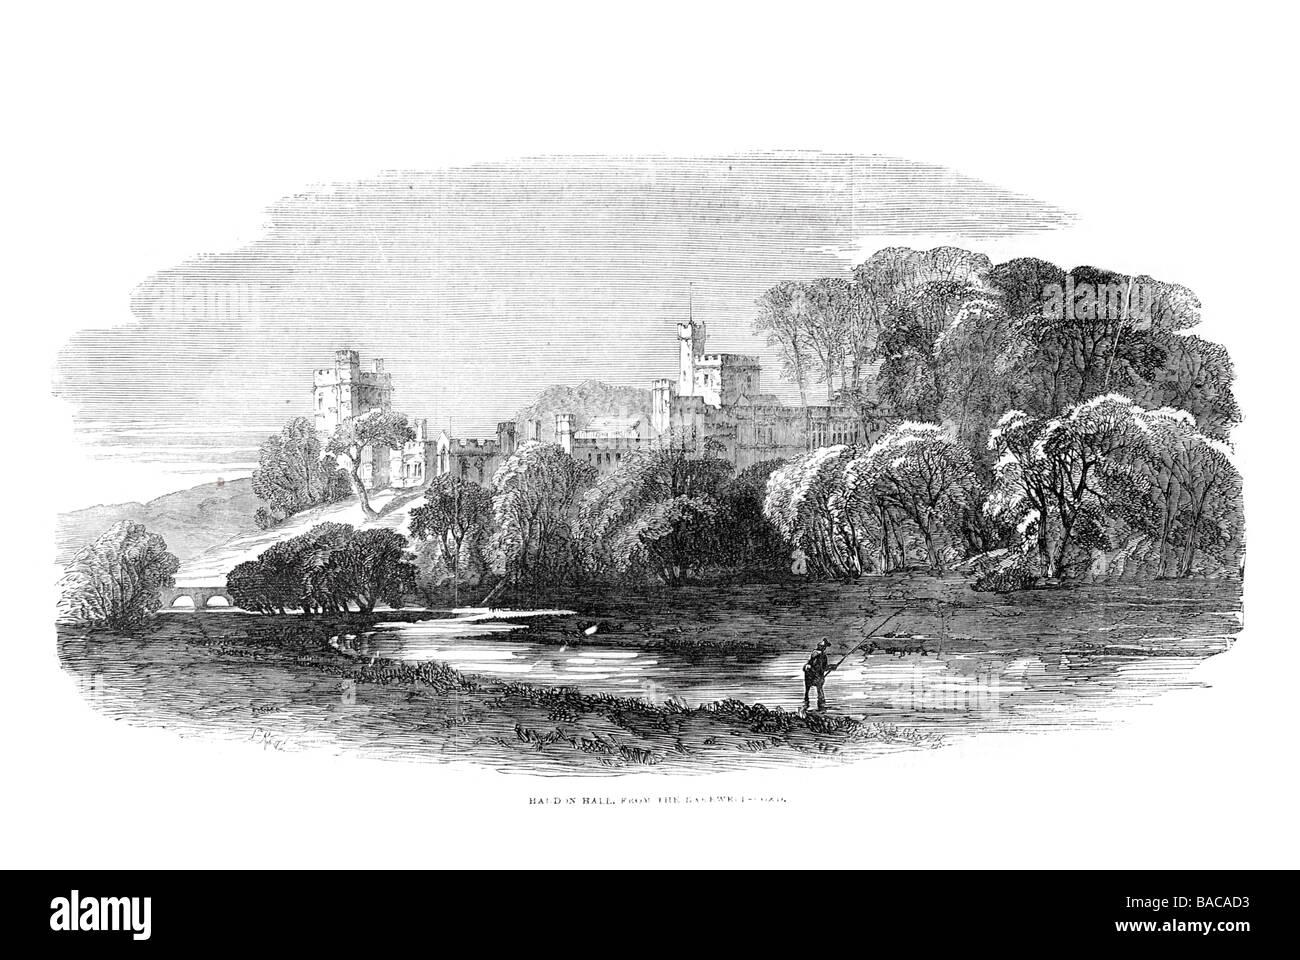 haldon hall 1854 river fishing castle fort Exe Estuary Lawrence Castle Lawrence Castle prominent position hills - Stock Image